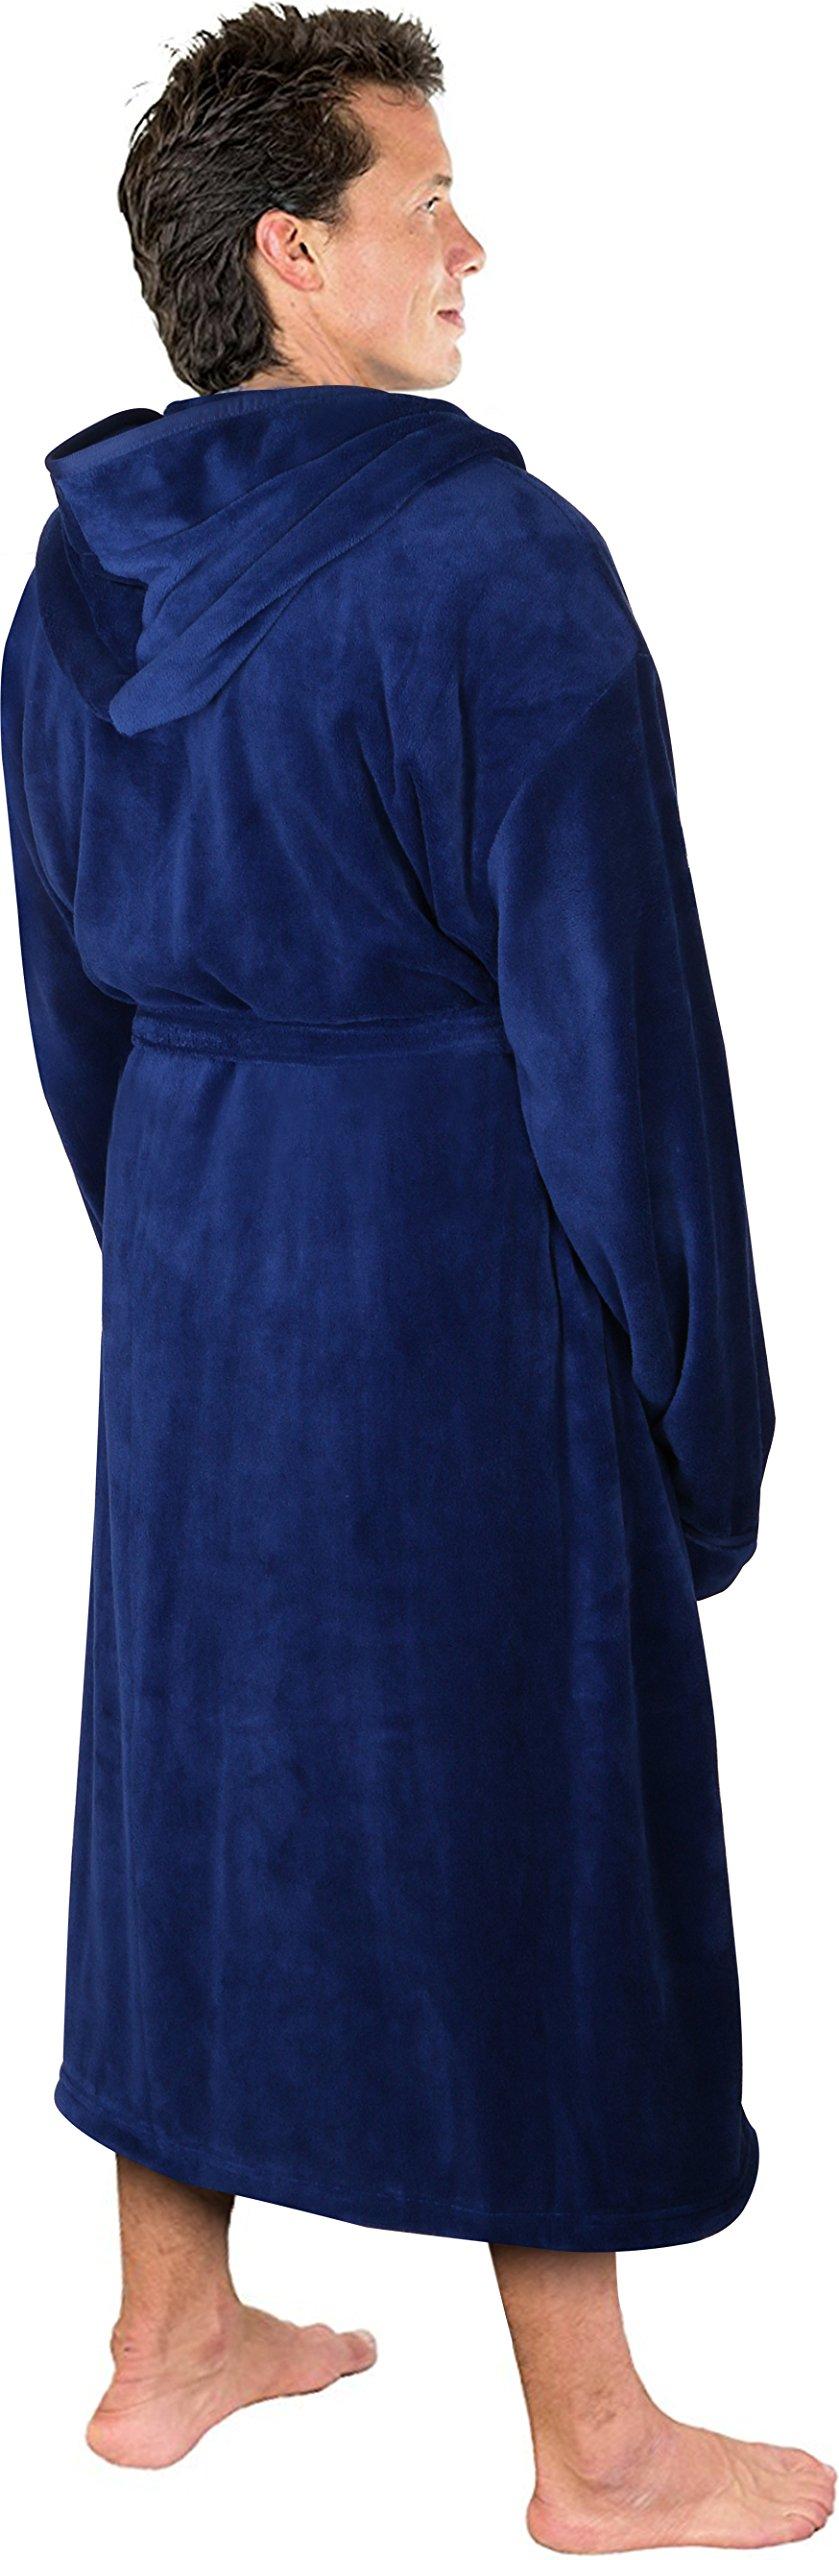 NY Threads Luxurious Men's Shawl Collar Fleece Bathrobe with Hood (Navy, S/M)